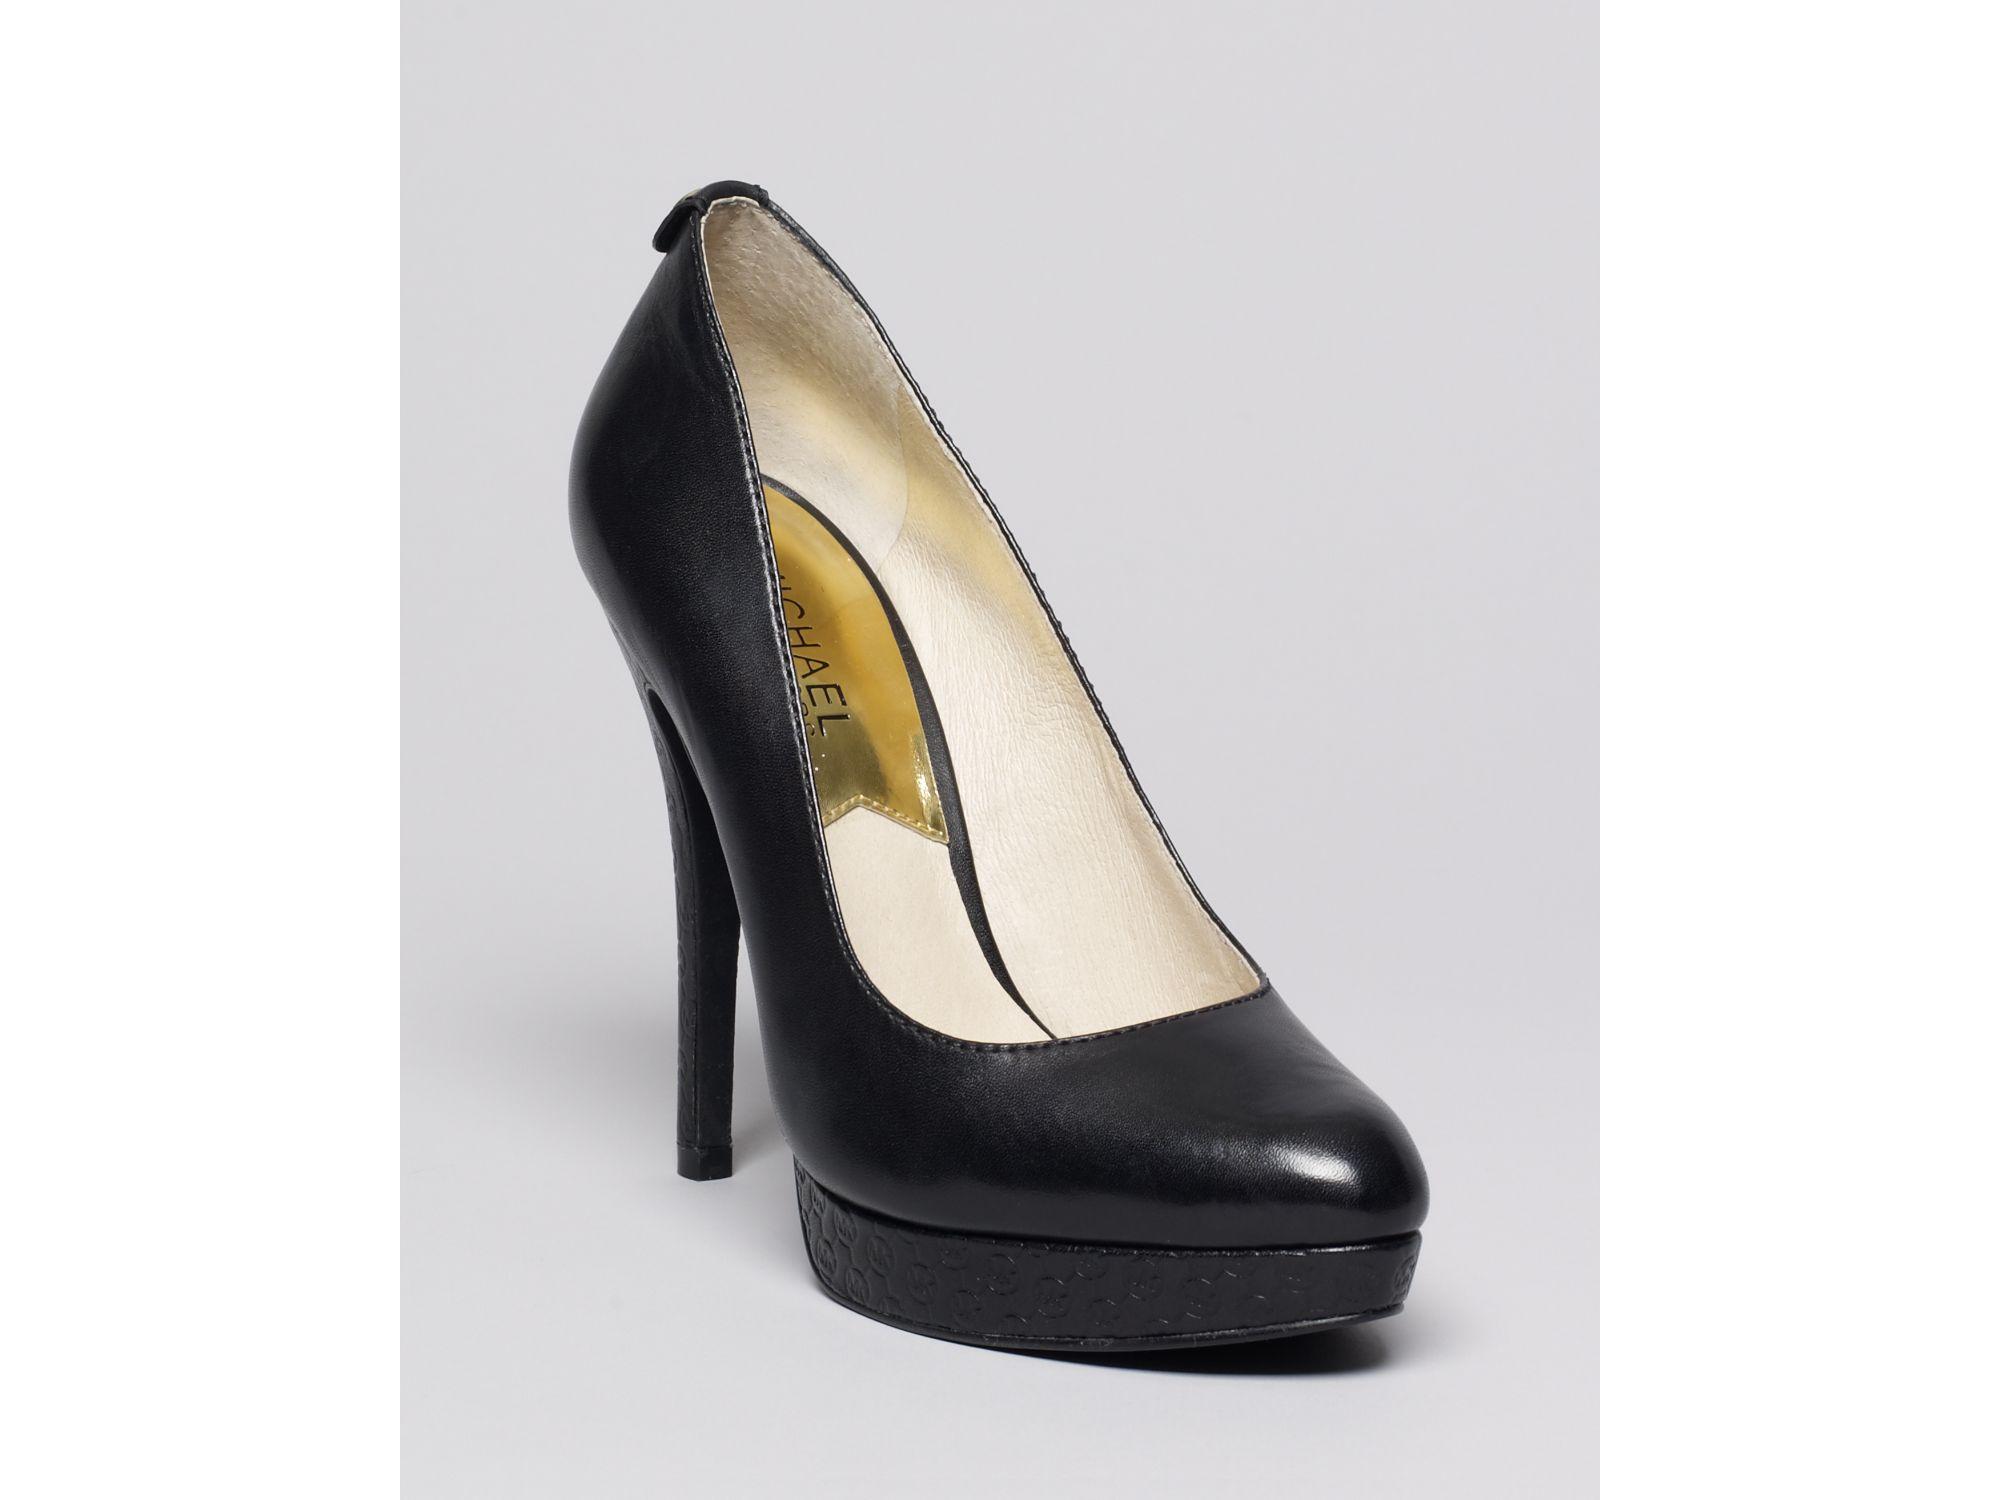 michael by michael kors platform pumps york high heel in black lyst. Black Bedroom Furniture Sets. Home Design Ideas